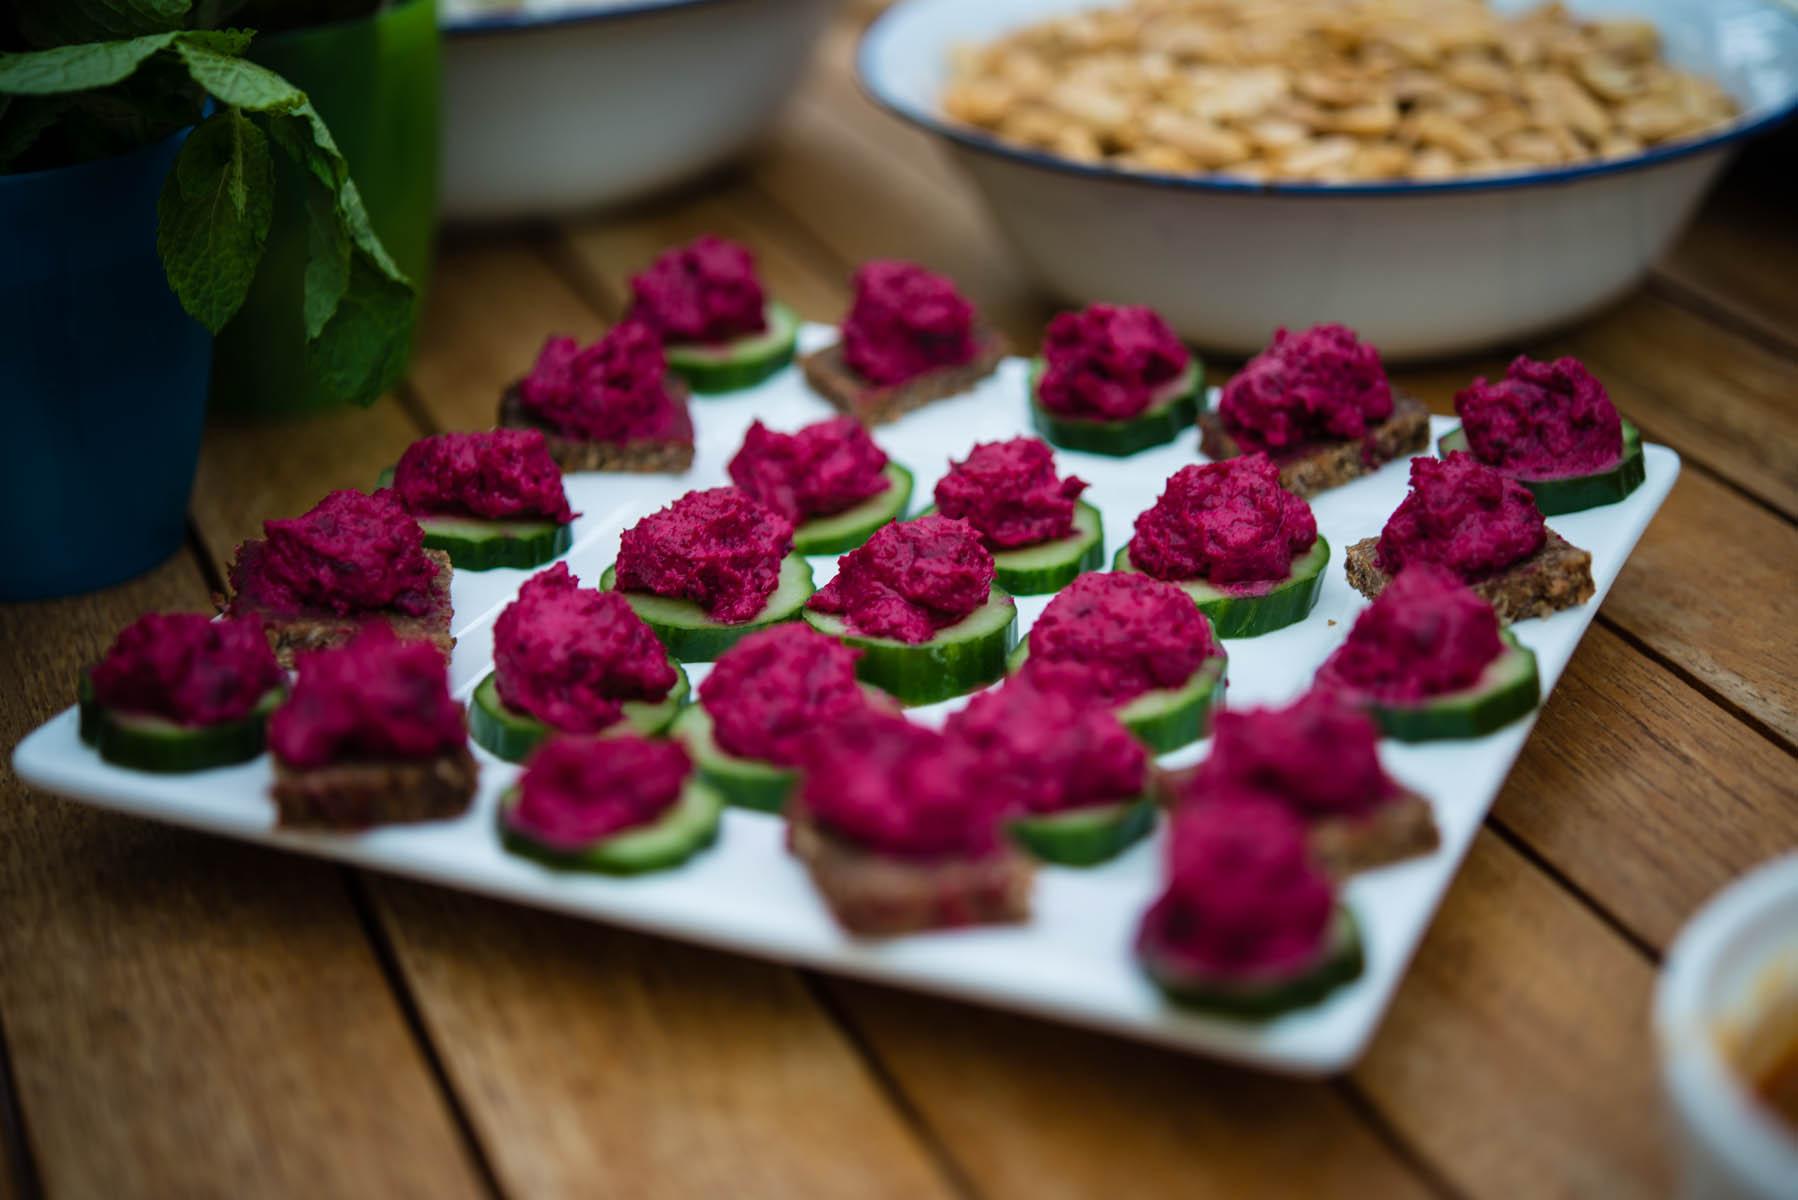 High tea menus and recipes - Beetroot Hummus